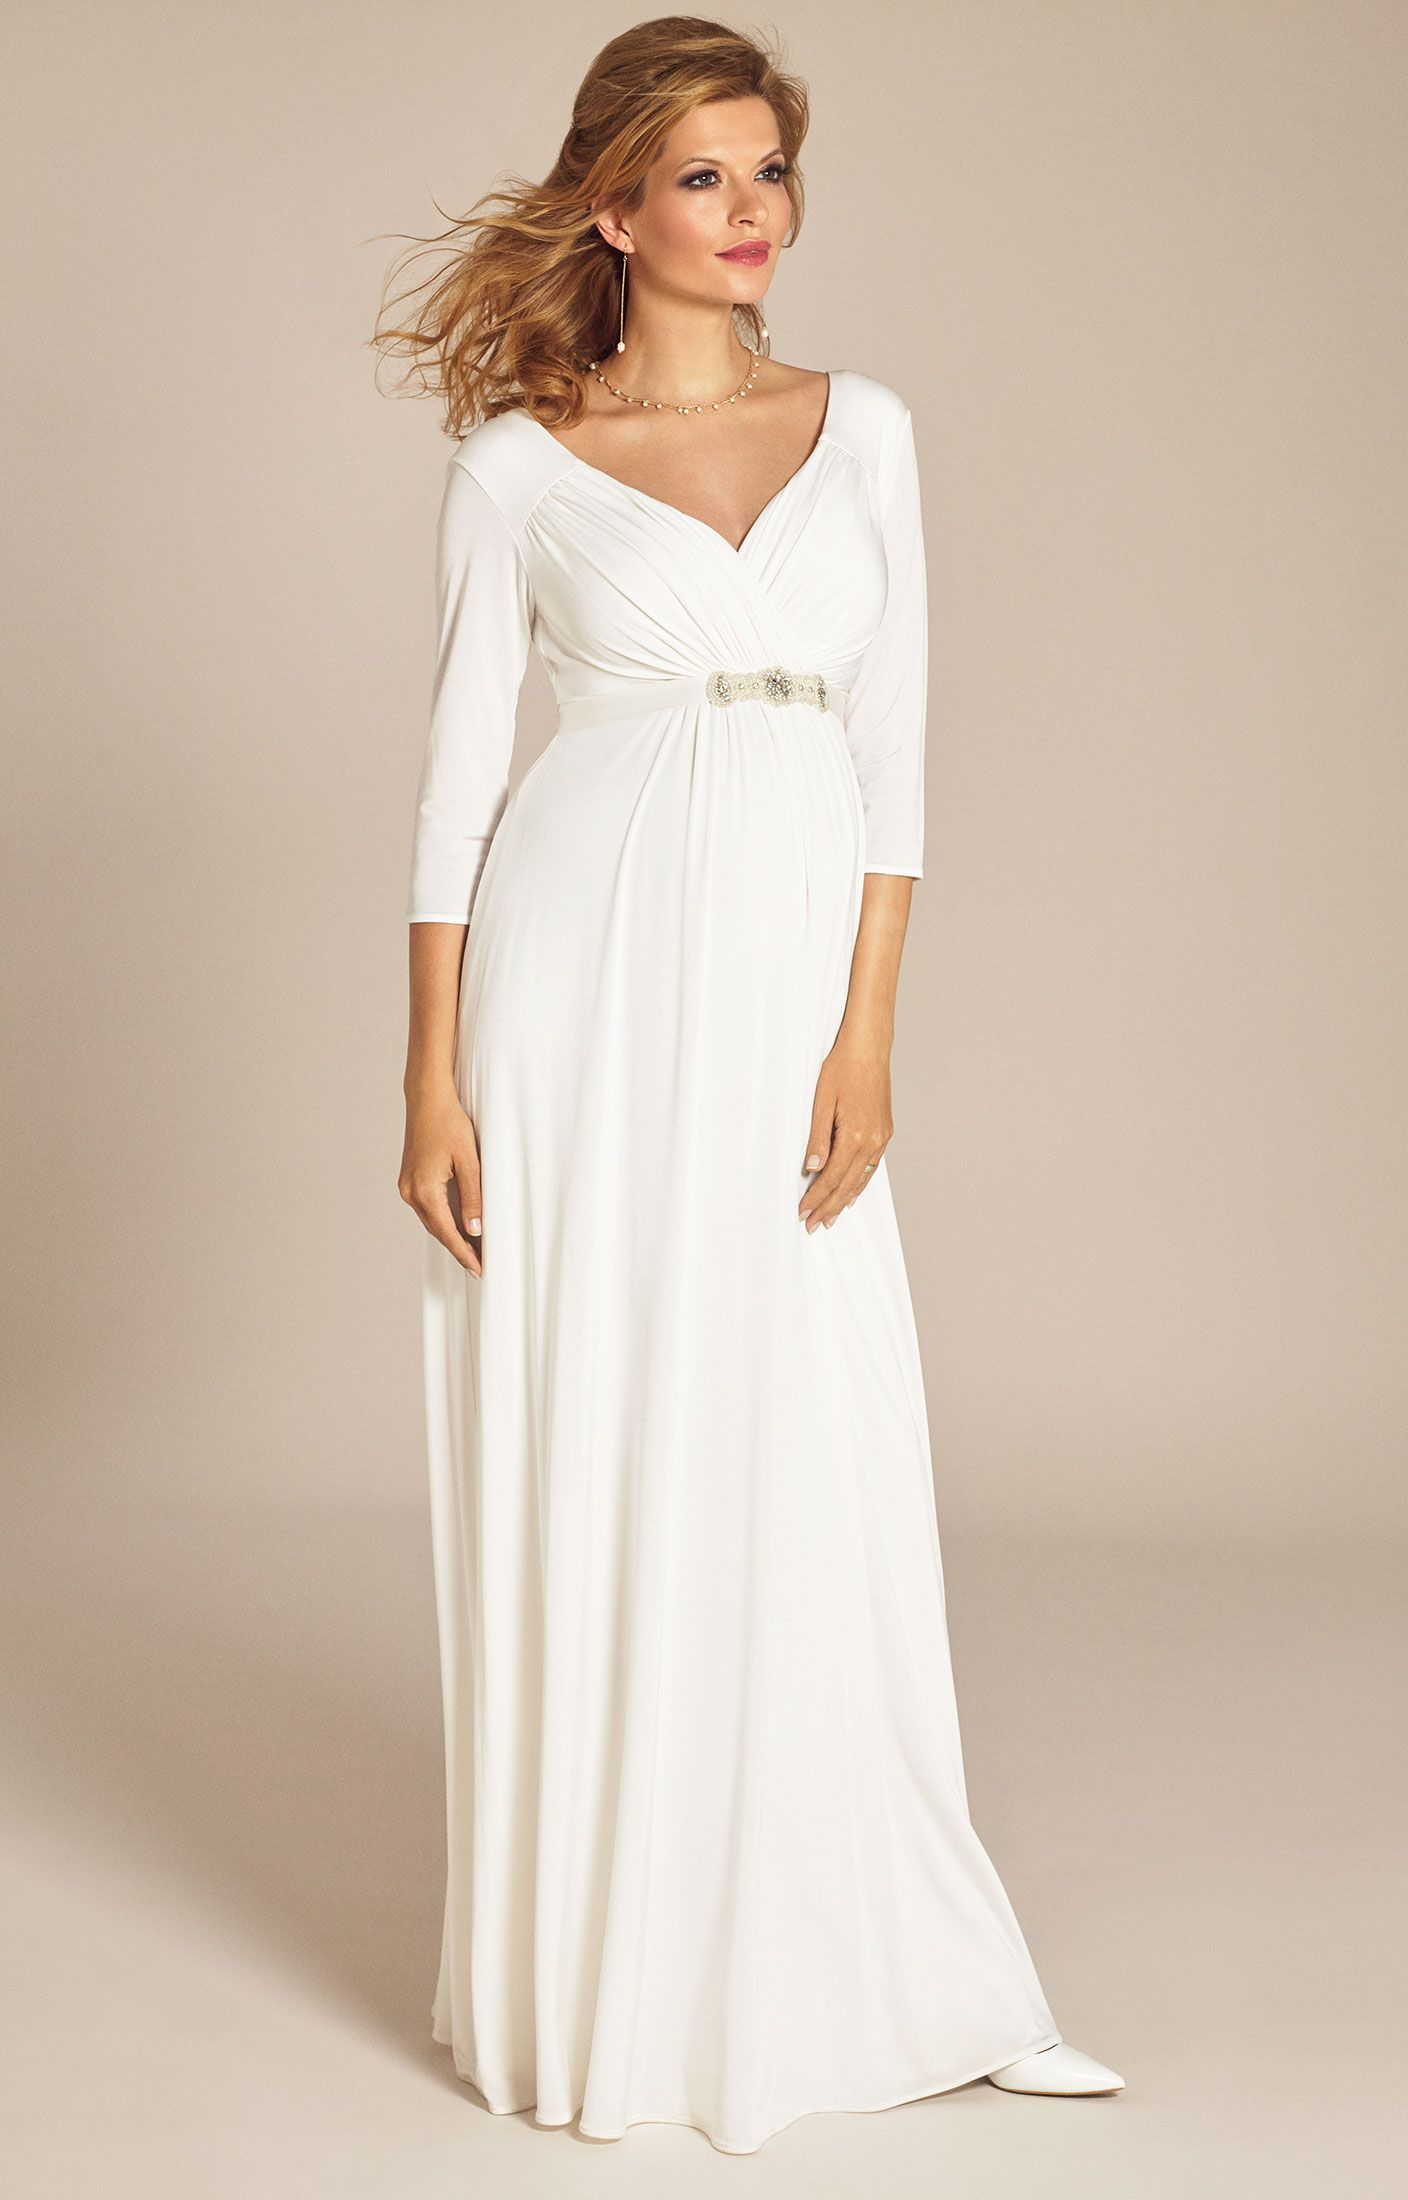 Lexi maternity wedding gown ivory maternity wedding